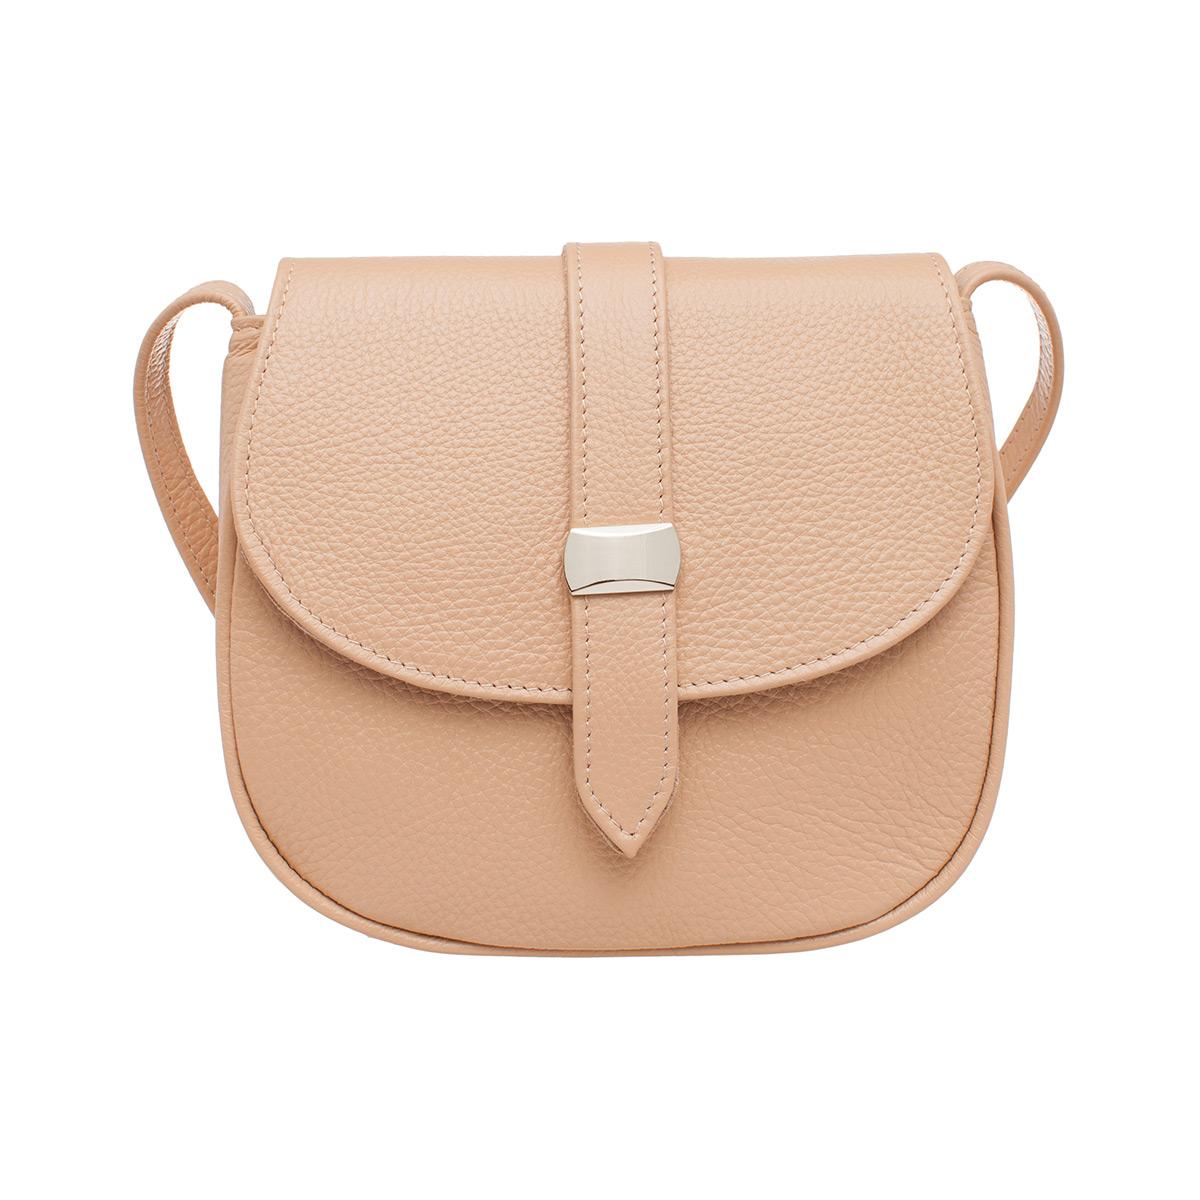 Женская сумка через плечо Baglyn Peach фото